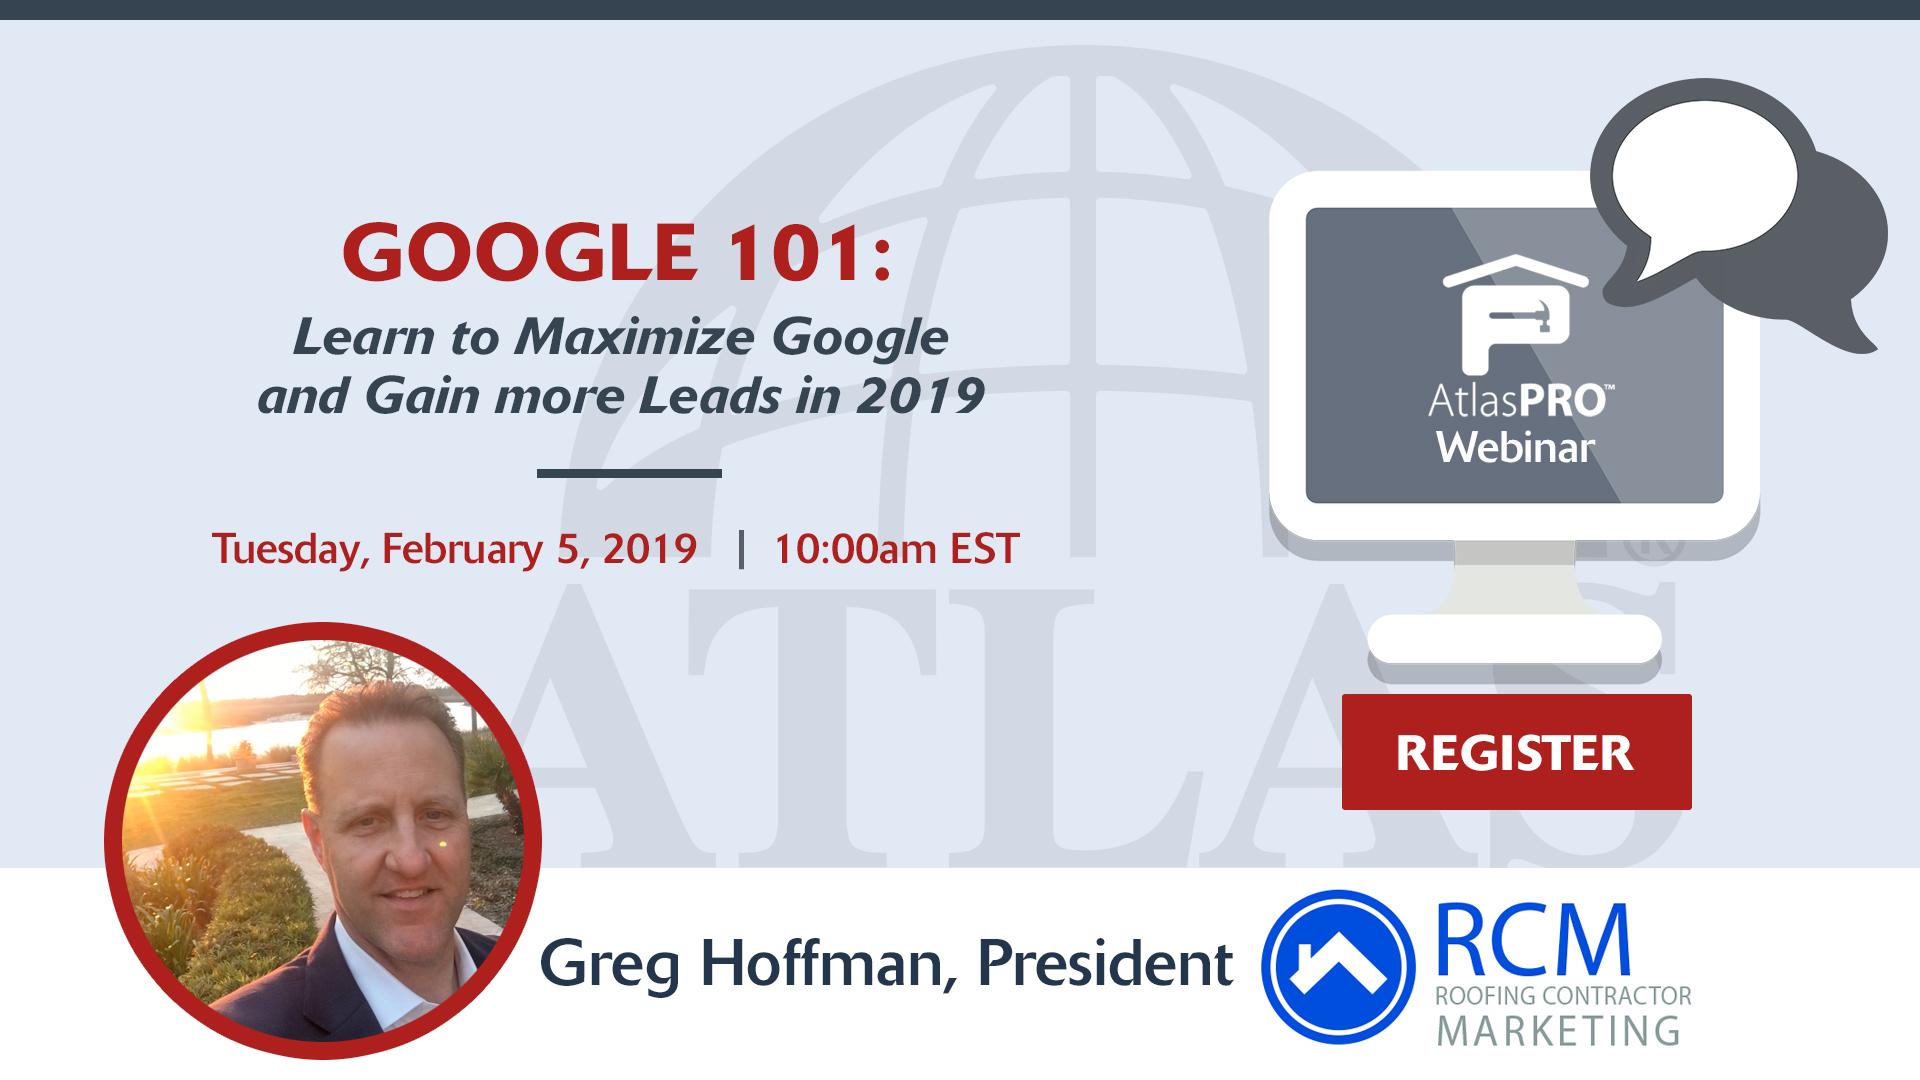 Webinar Invitation for Google 101